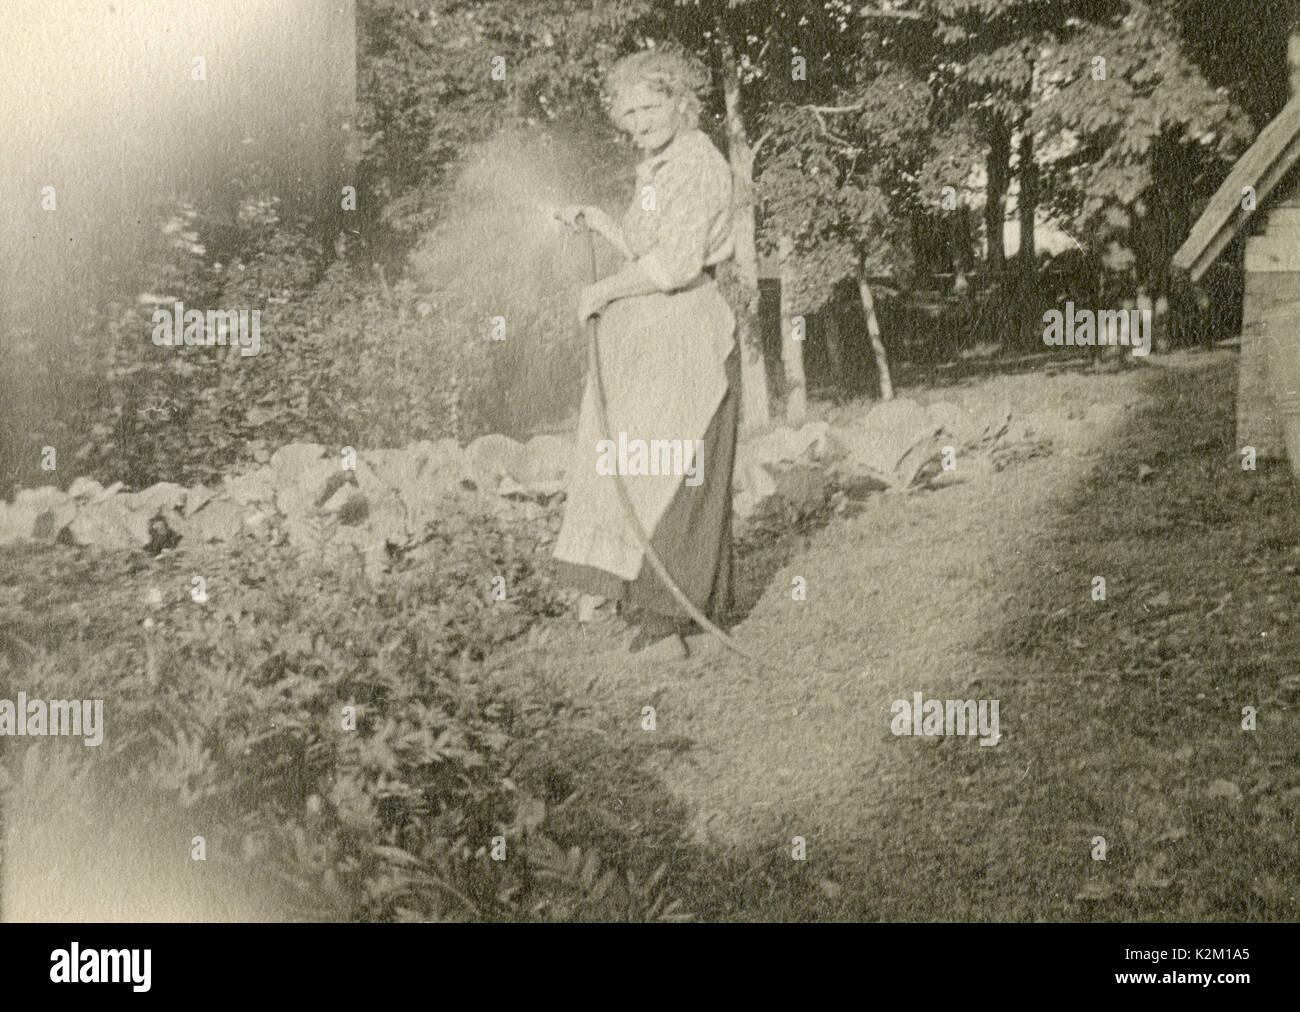 Antique c1930 photograph, elderly woman watering her garden. SOURCE: ORIGINAL PHOTOGRAPH. - Stock Image